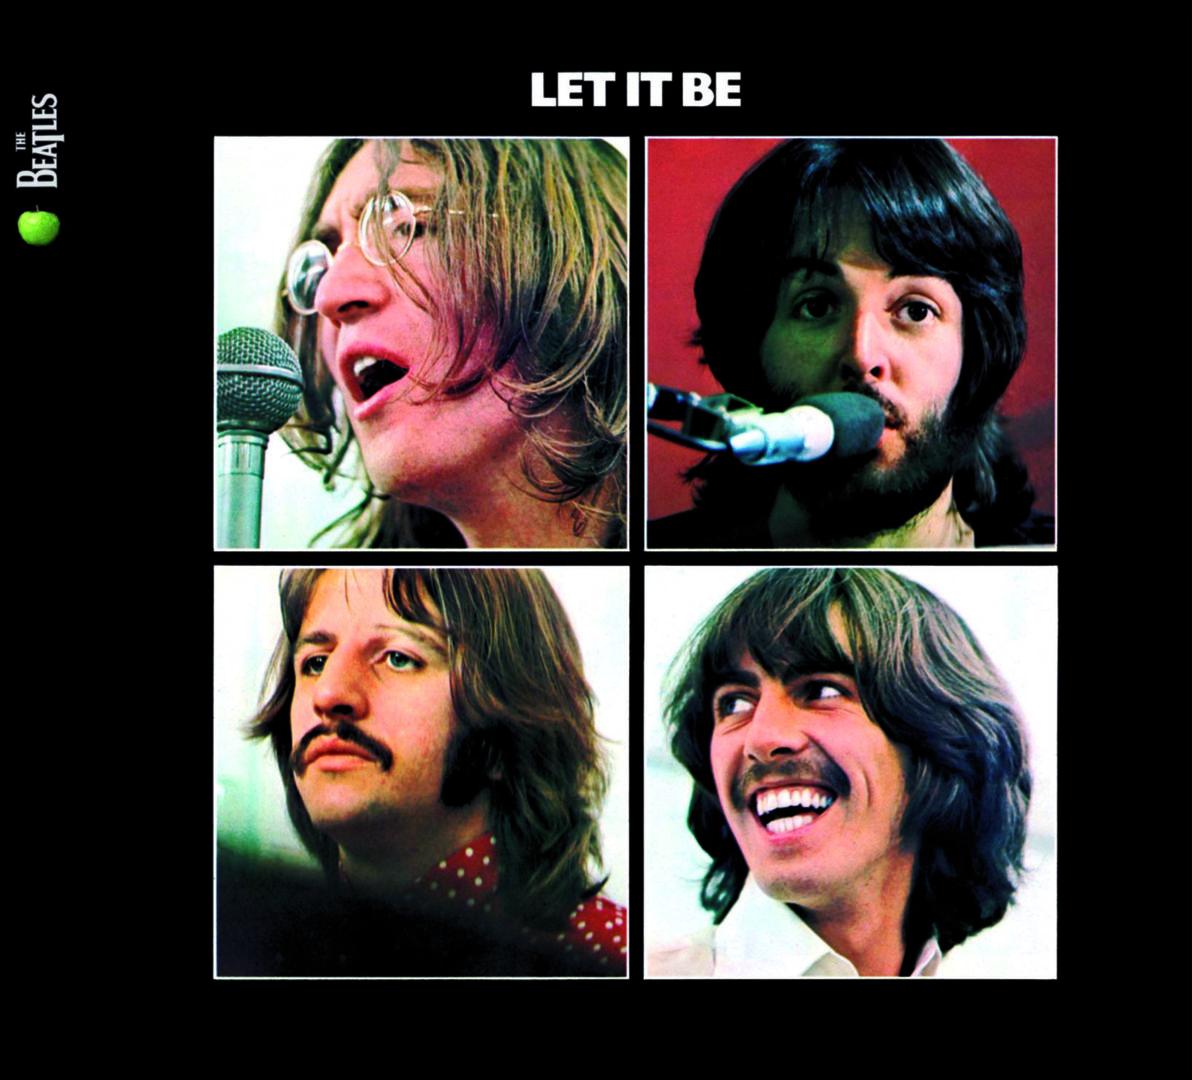 Anhörbar: Let It Be (1970)